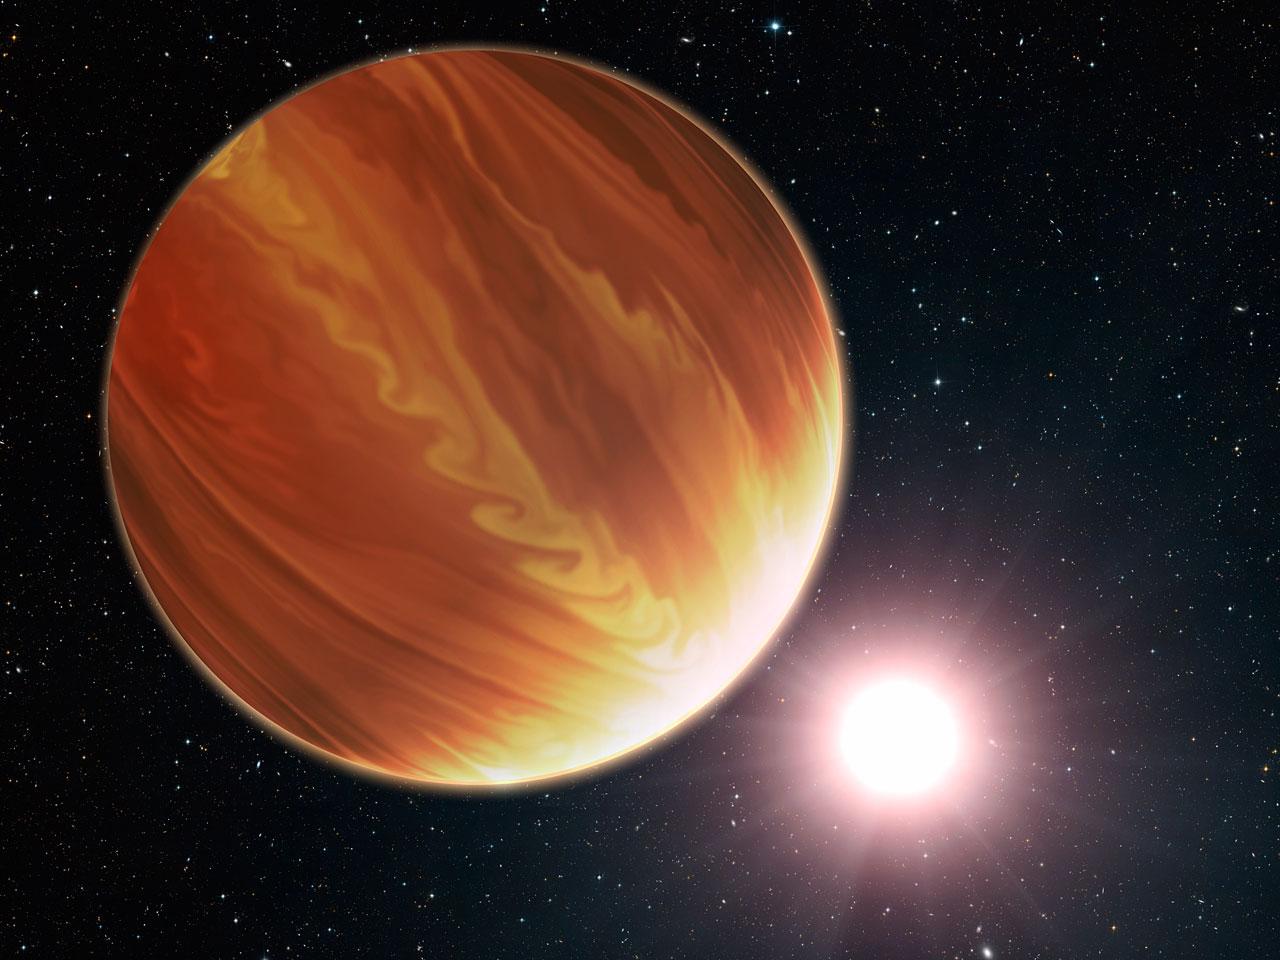 Artist's impression of the hot planet Osiris